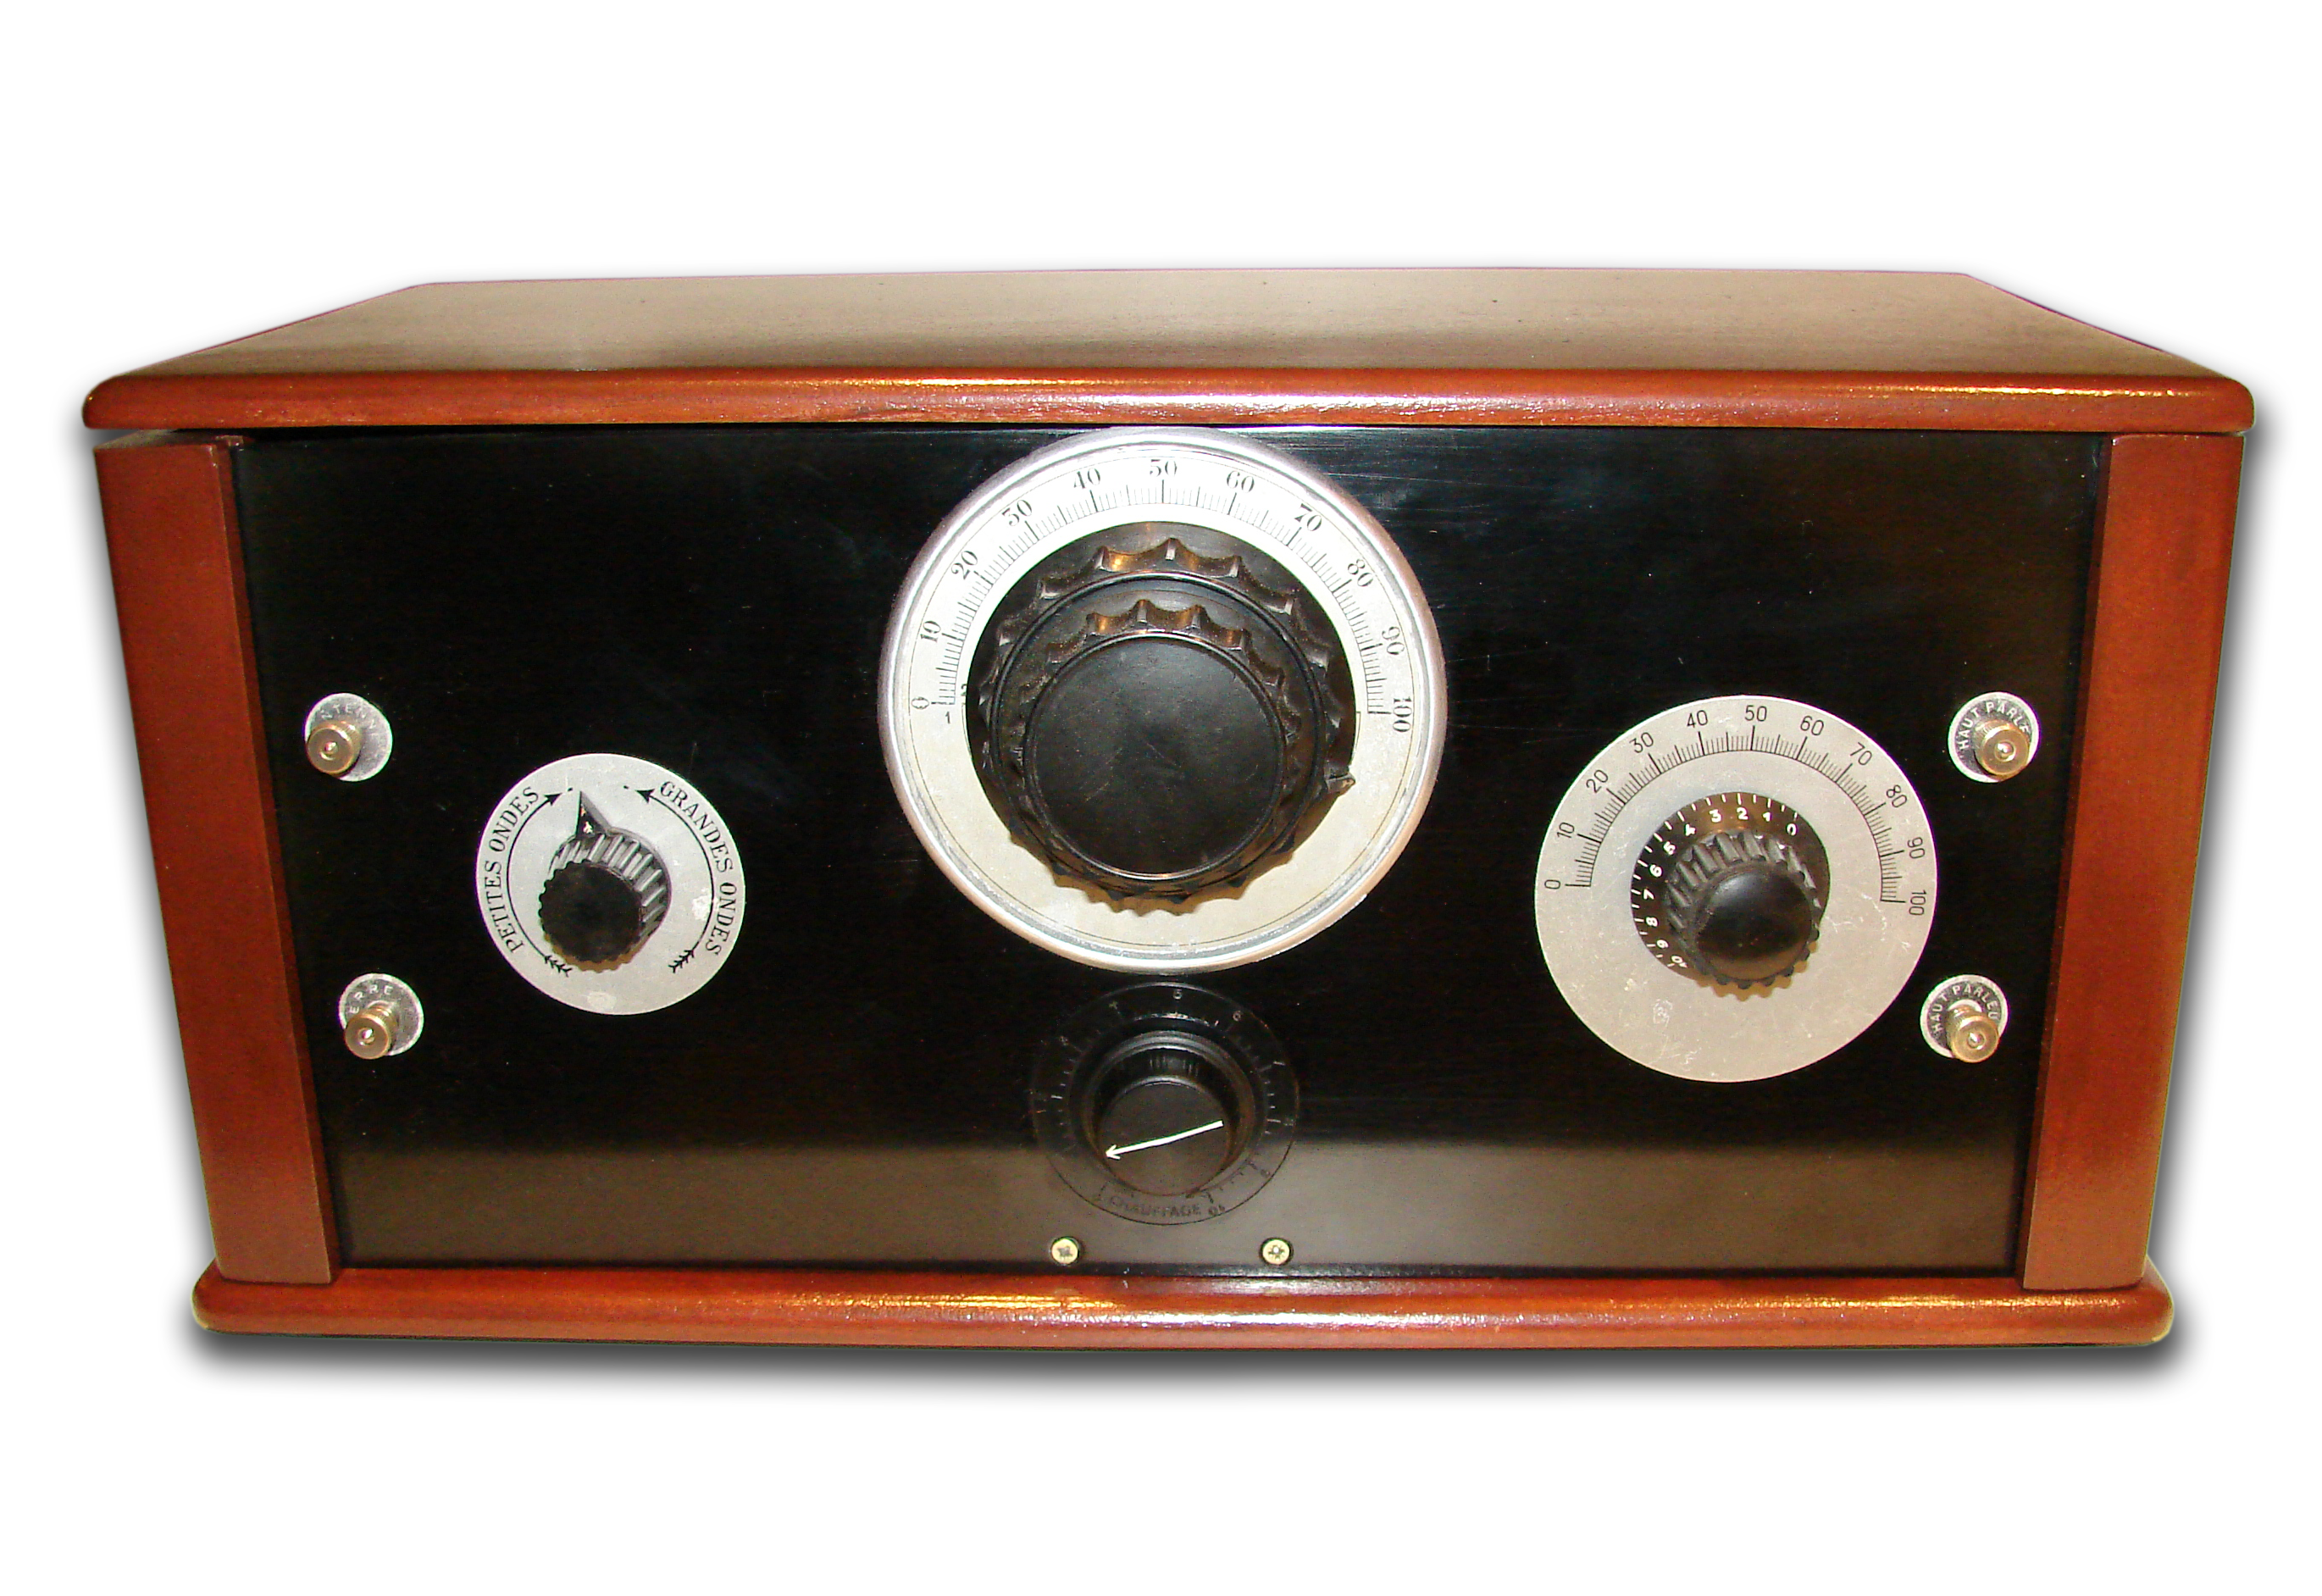 Radio Tsf Vintage Antique Poste Batterie Type Le Synchrone Oldtimeradiogoldenage Old Time Radio Radio Old Radios